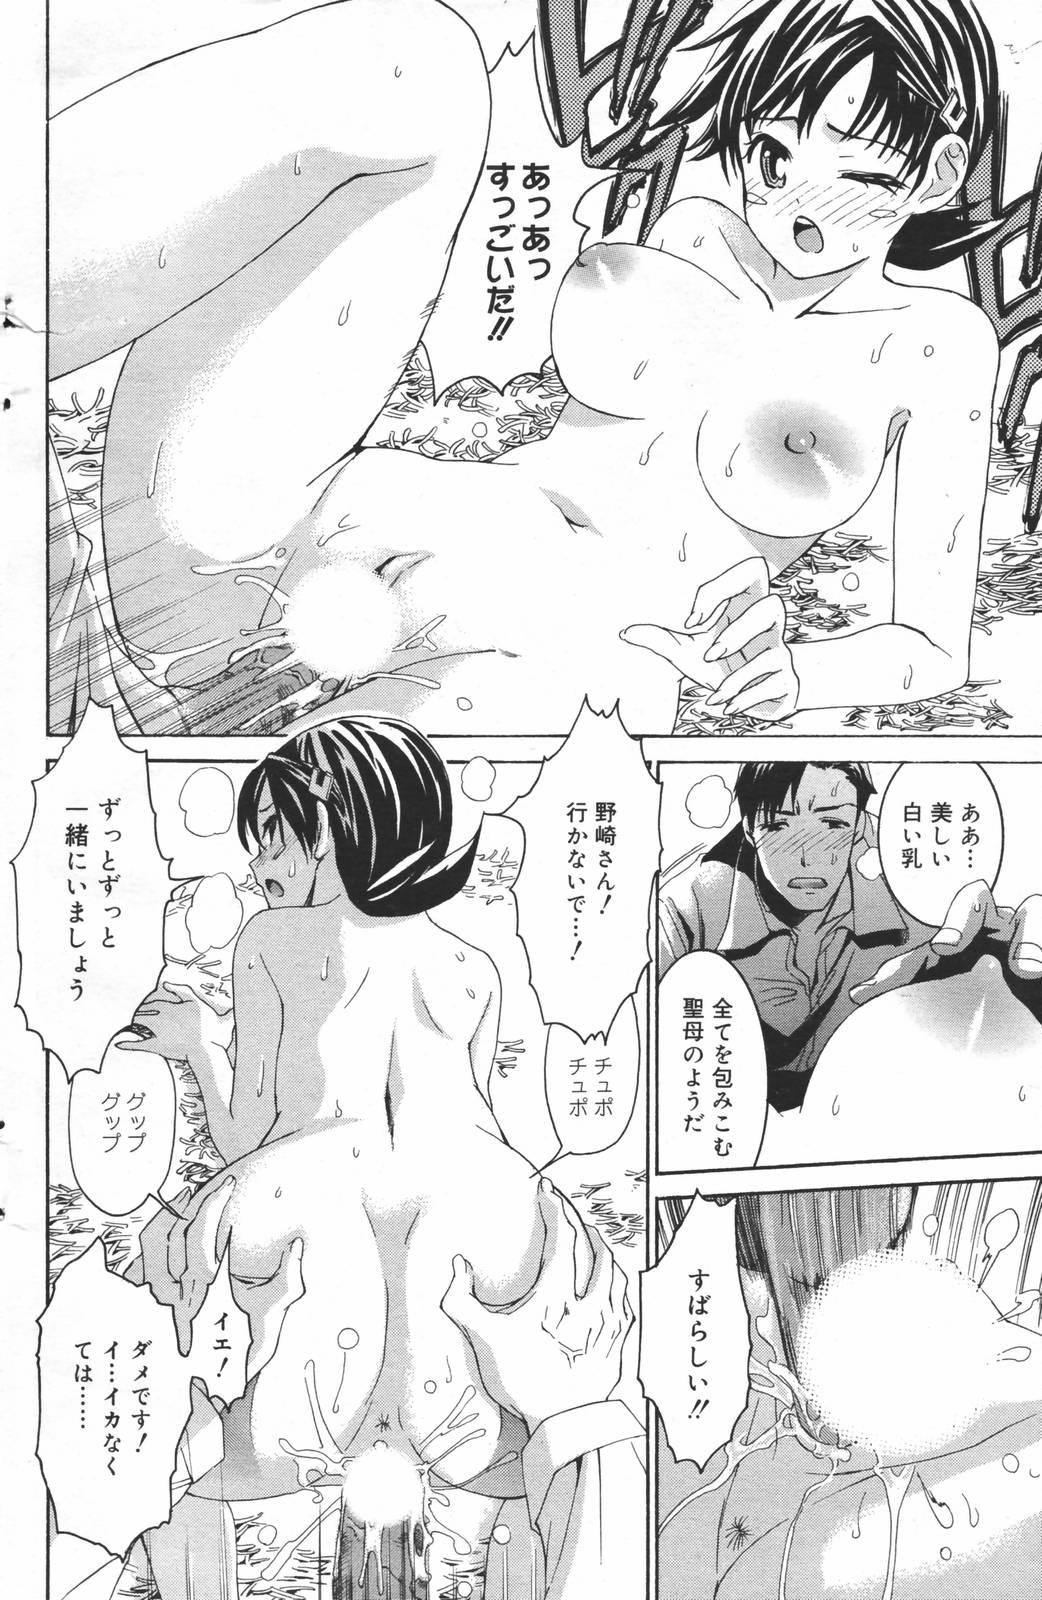 Manga Bangaichi 2007-03 139